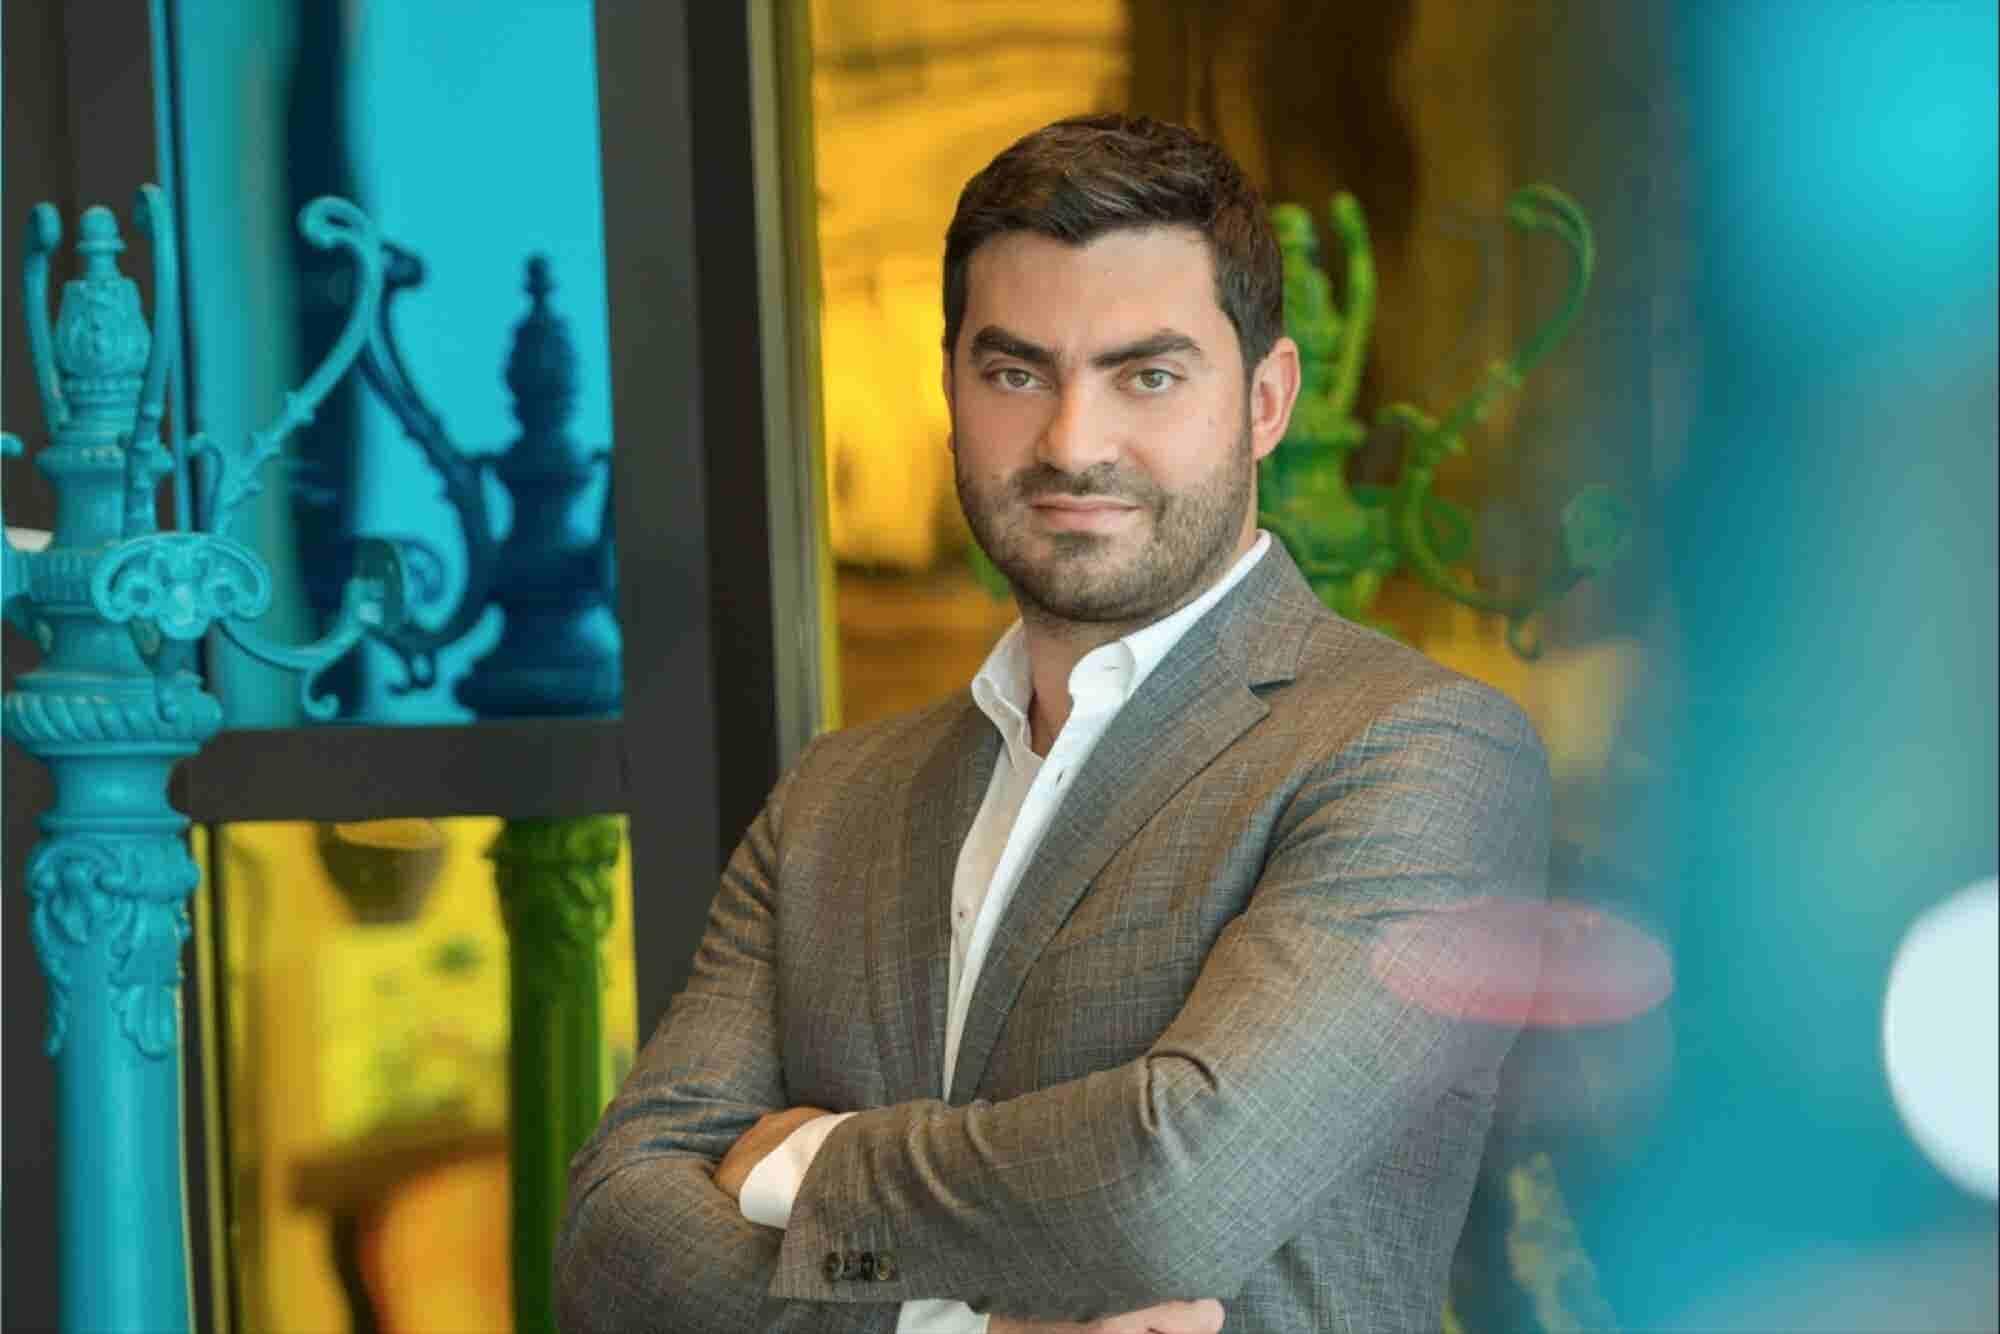 A Discourse On Design With Entrepreneur Hazem Aljesr, Founder, Cities Design, Art & Lifestyle Store